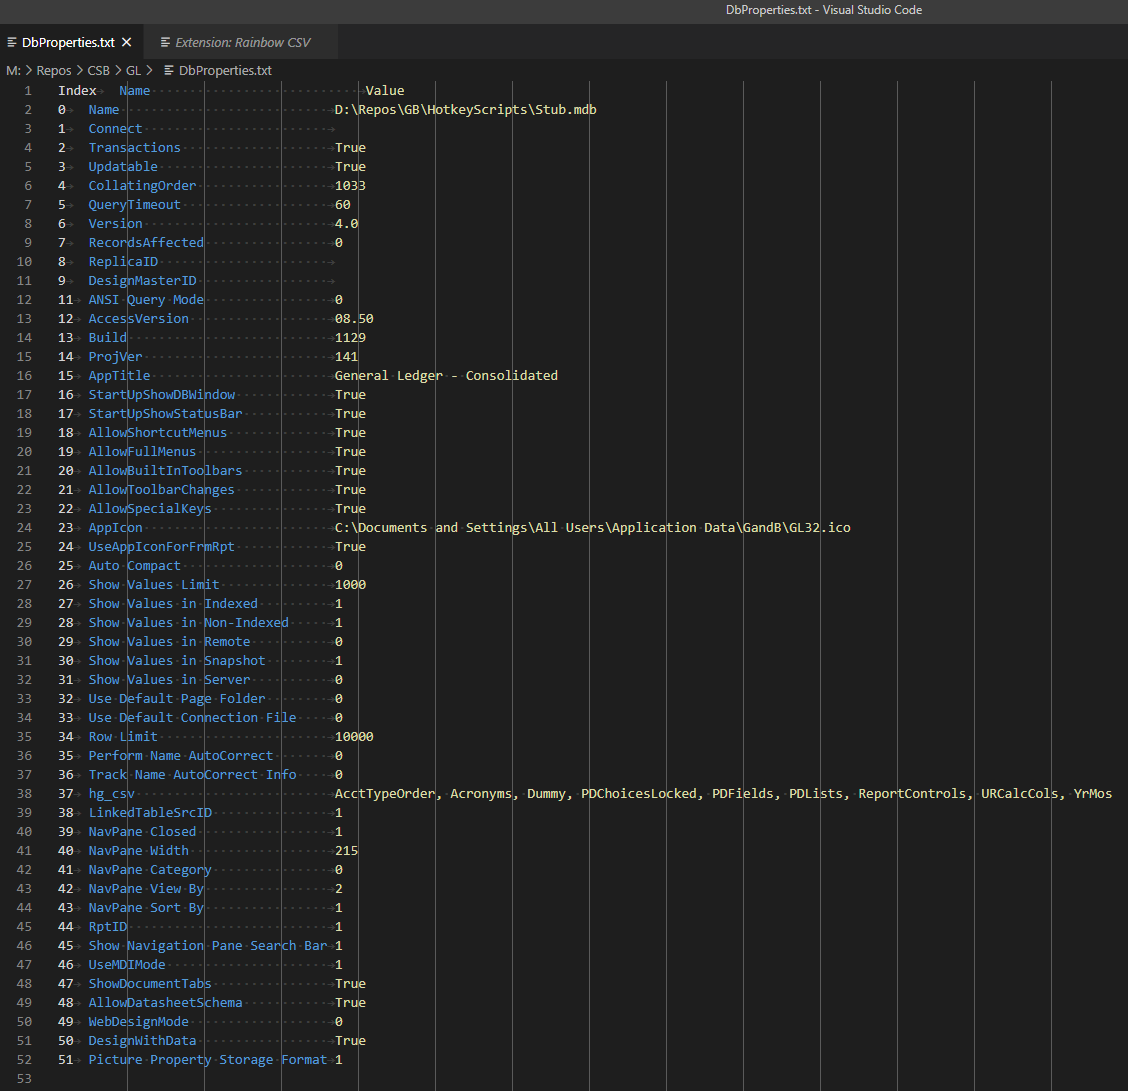 Screenshot of DbProperties.txt in Visual Studio Code